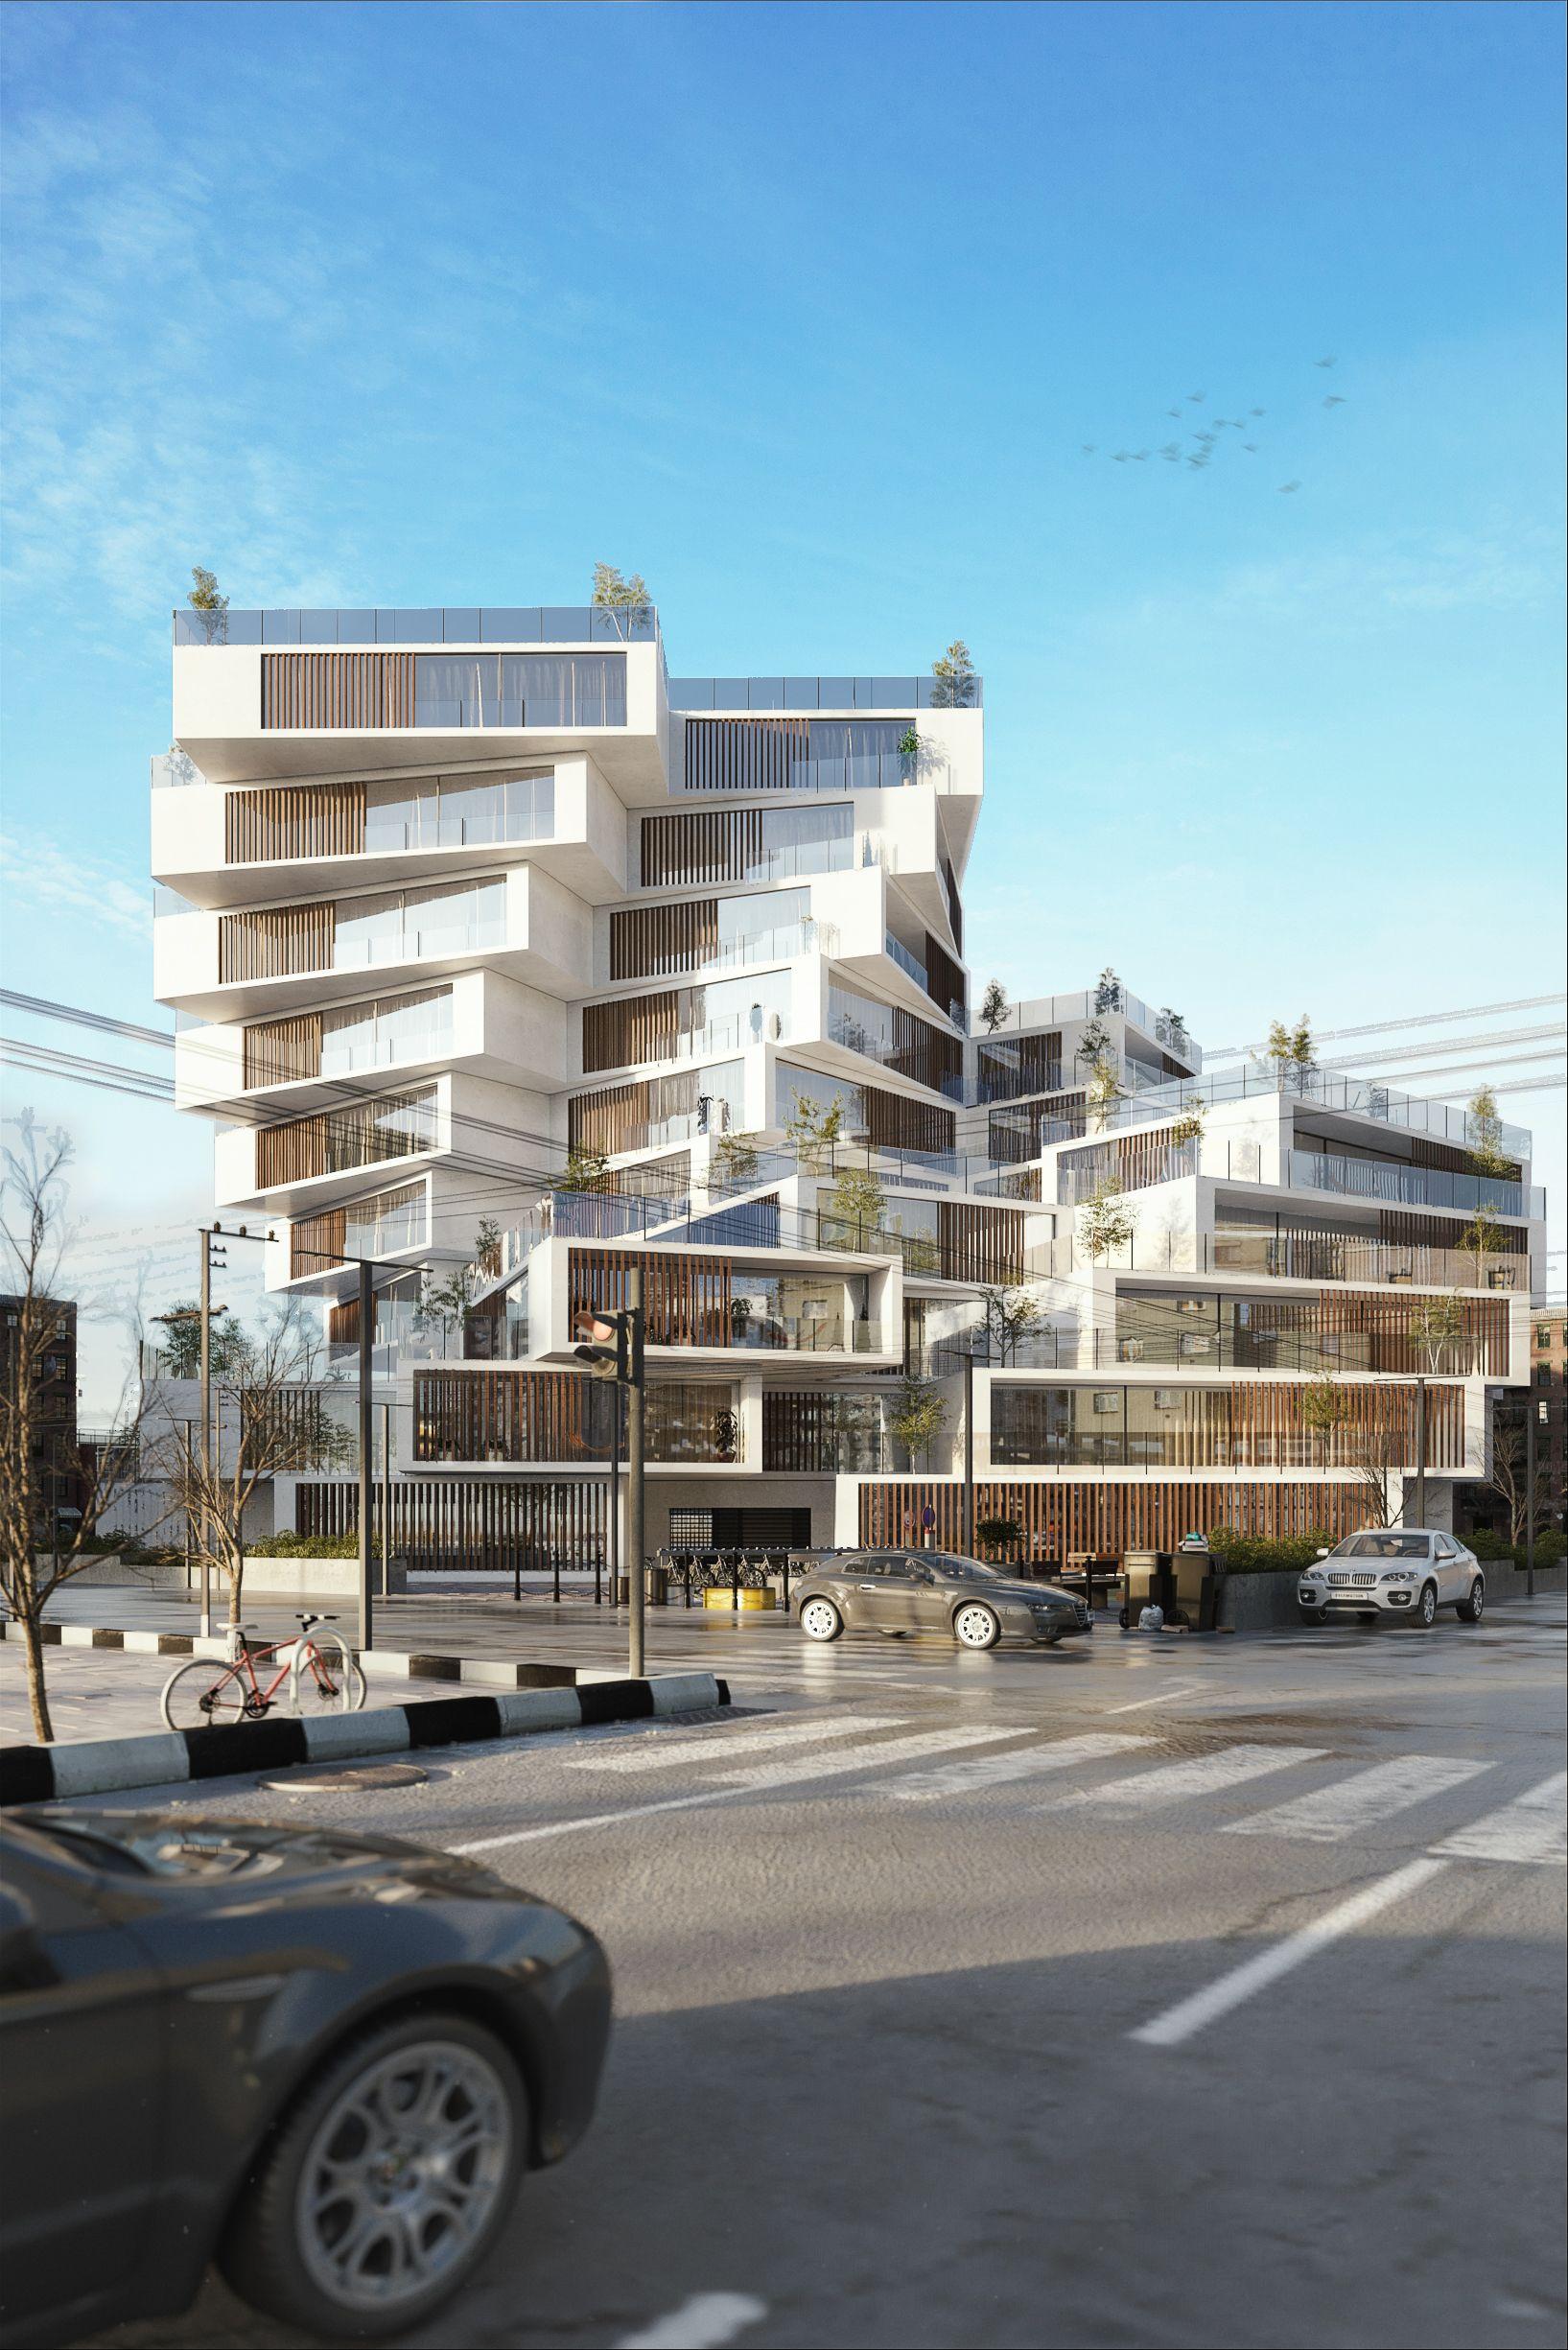 Residential comples design \u0026 visualization by Milad Eshtiyaghi ...